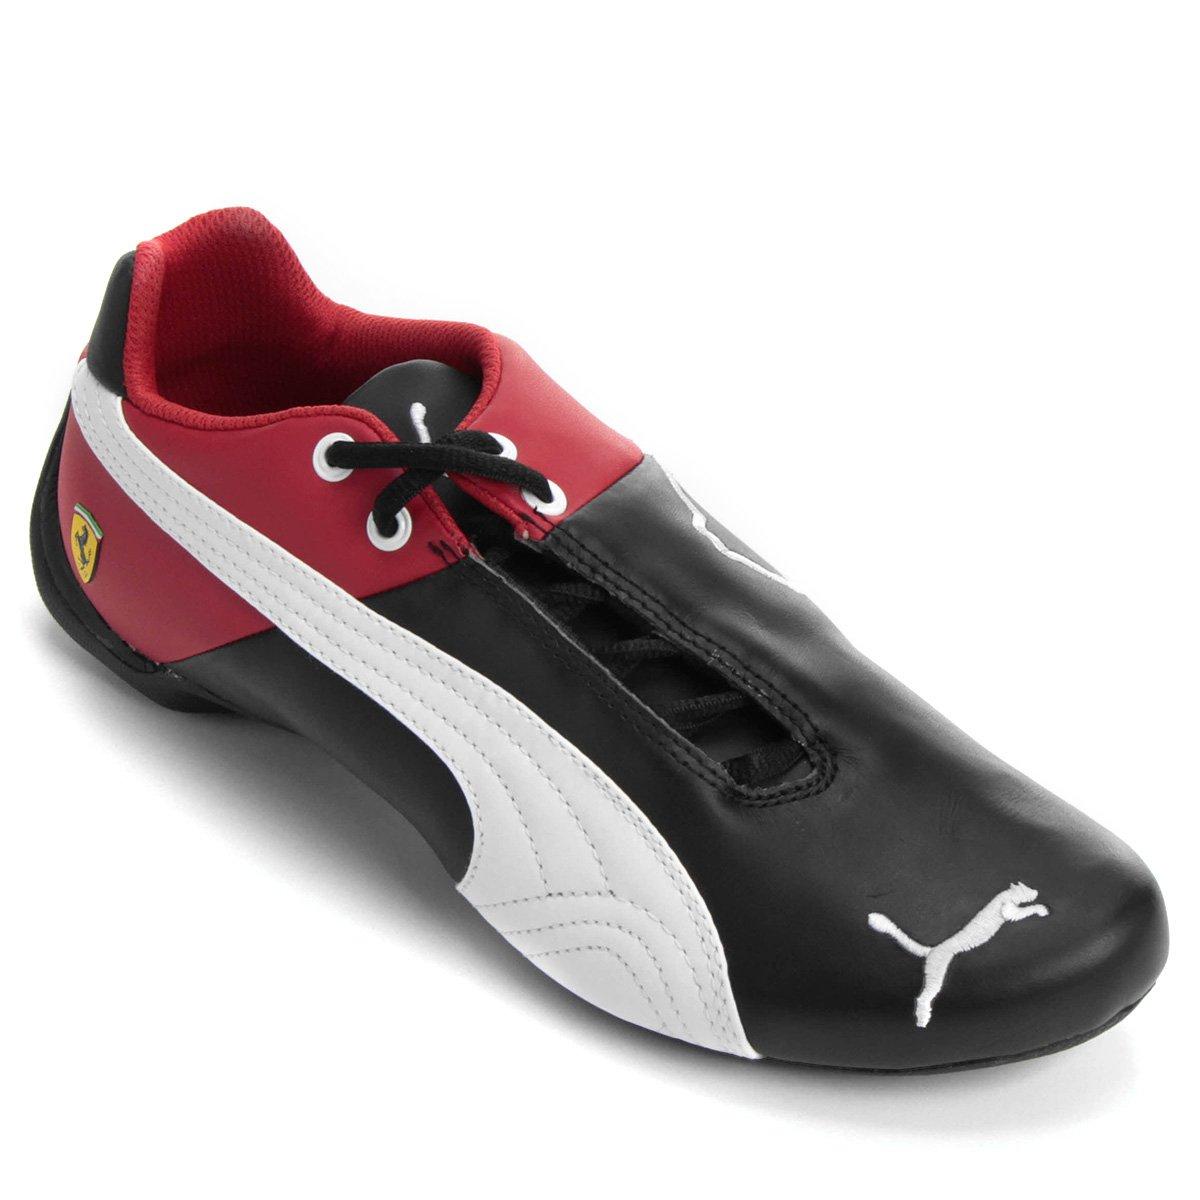 1b4f64b325d Tênis Puma Future Cat Scuderia Ferrari OG - Compre Agora